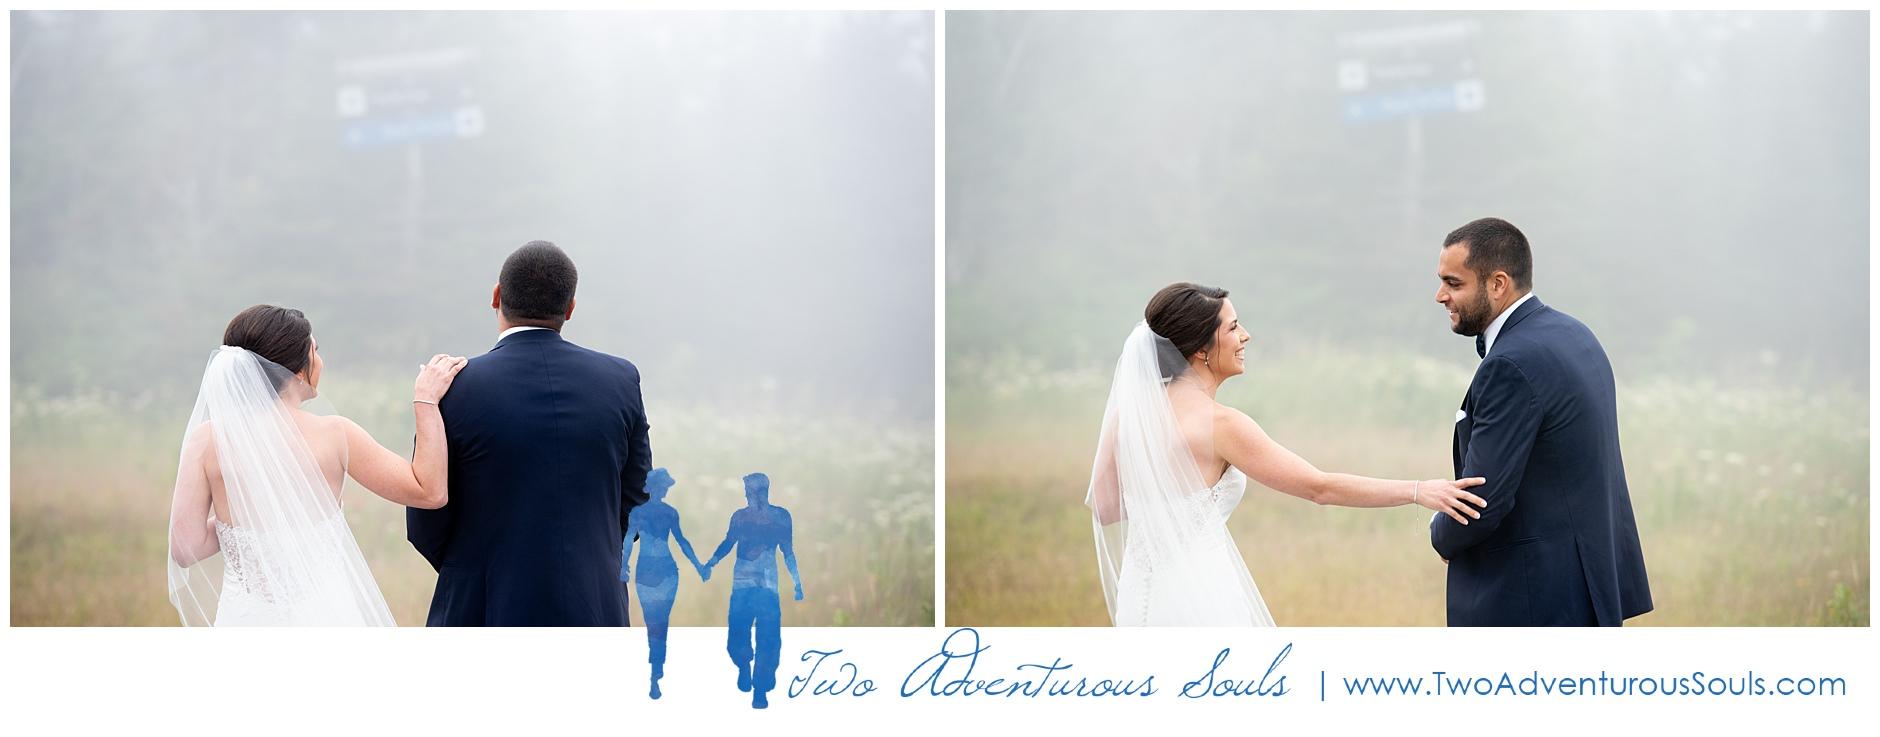 Sugarloaf Outdoor Center Wedding Photographers, Destination Wedding Photographers, Two Adventurous Souls-081719_0019.jpg